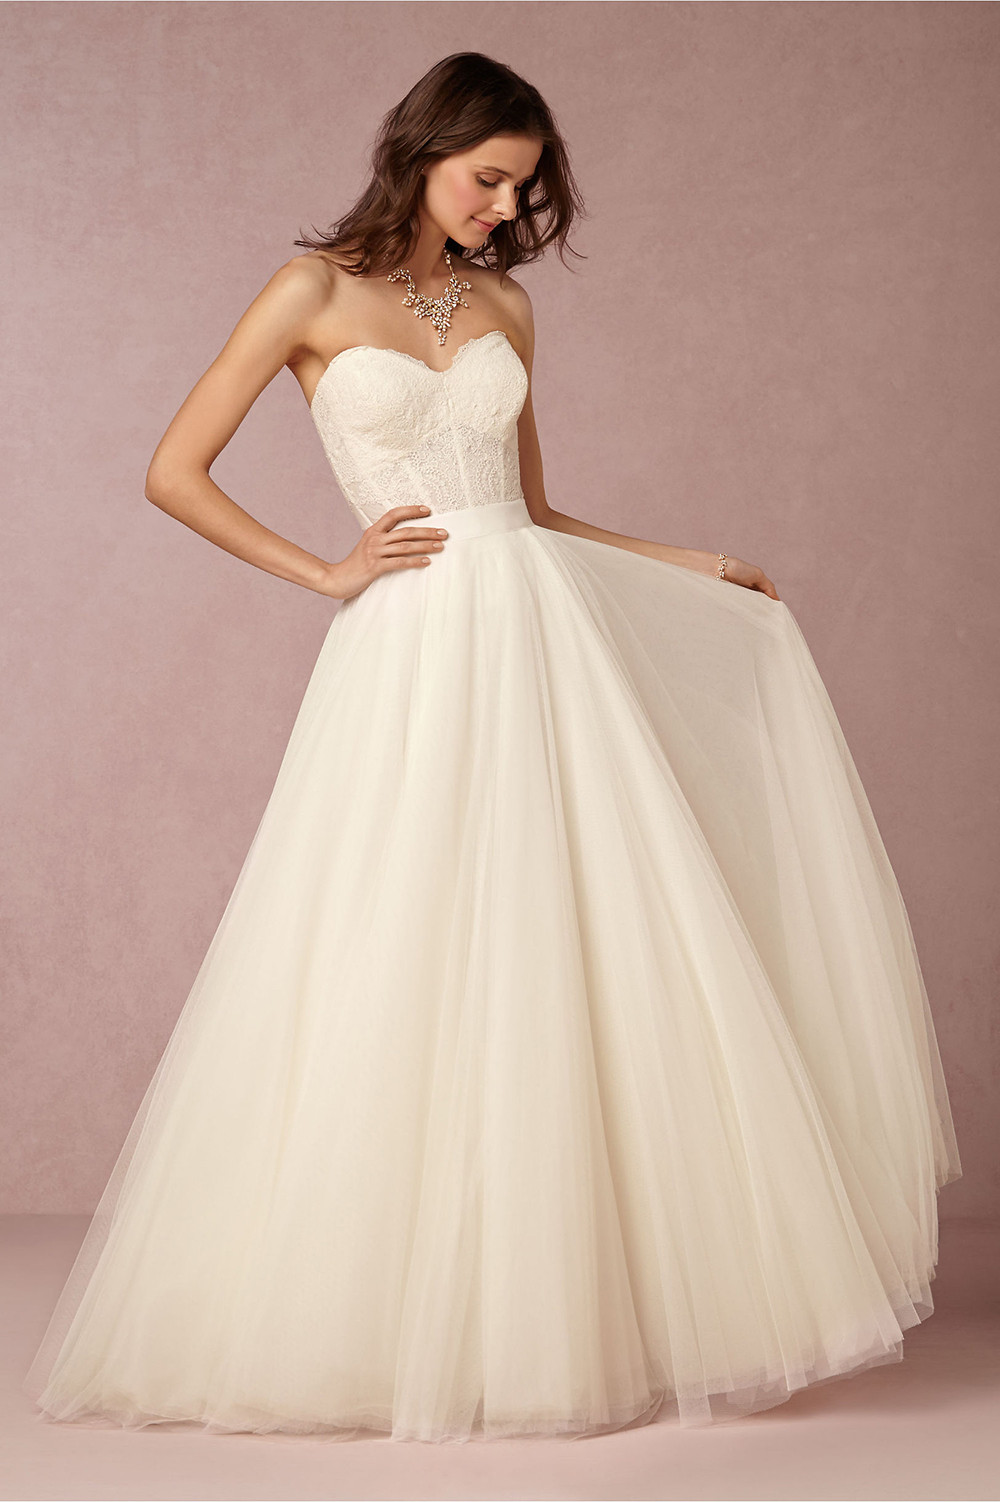 Corset Wedding Gown  Fancy Friday BHLDN Wedding Gowns